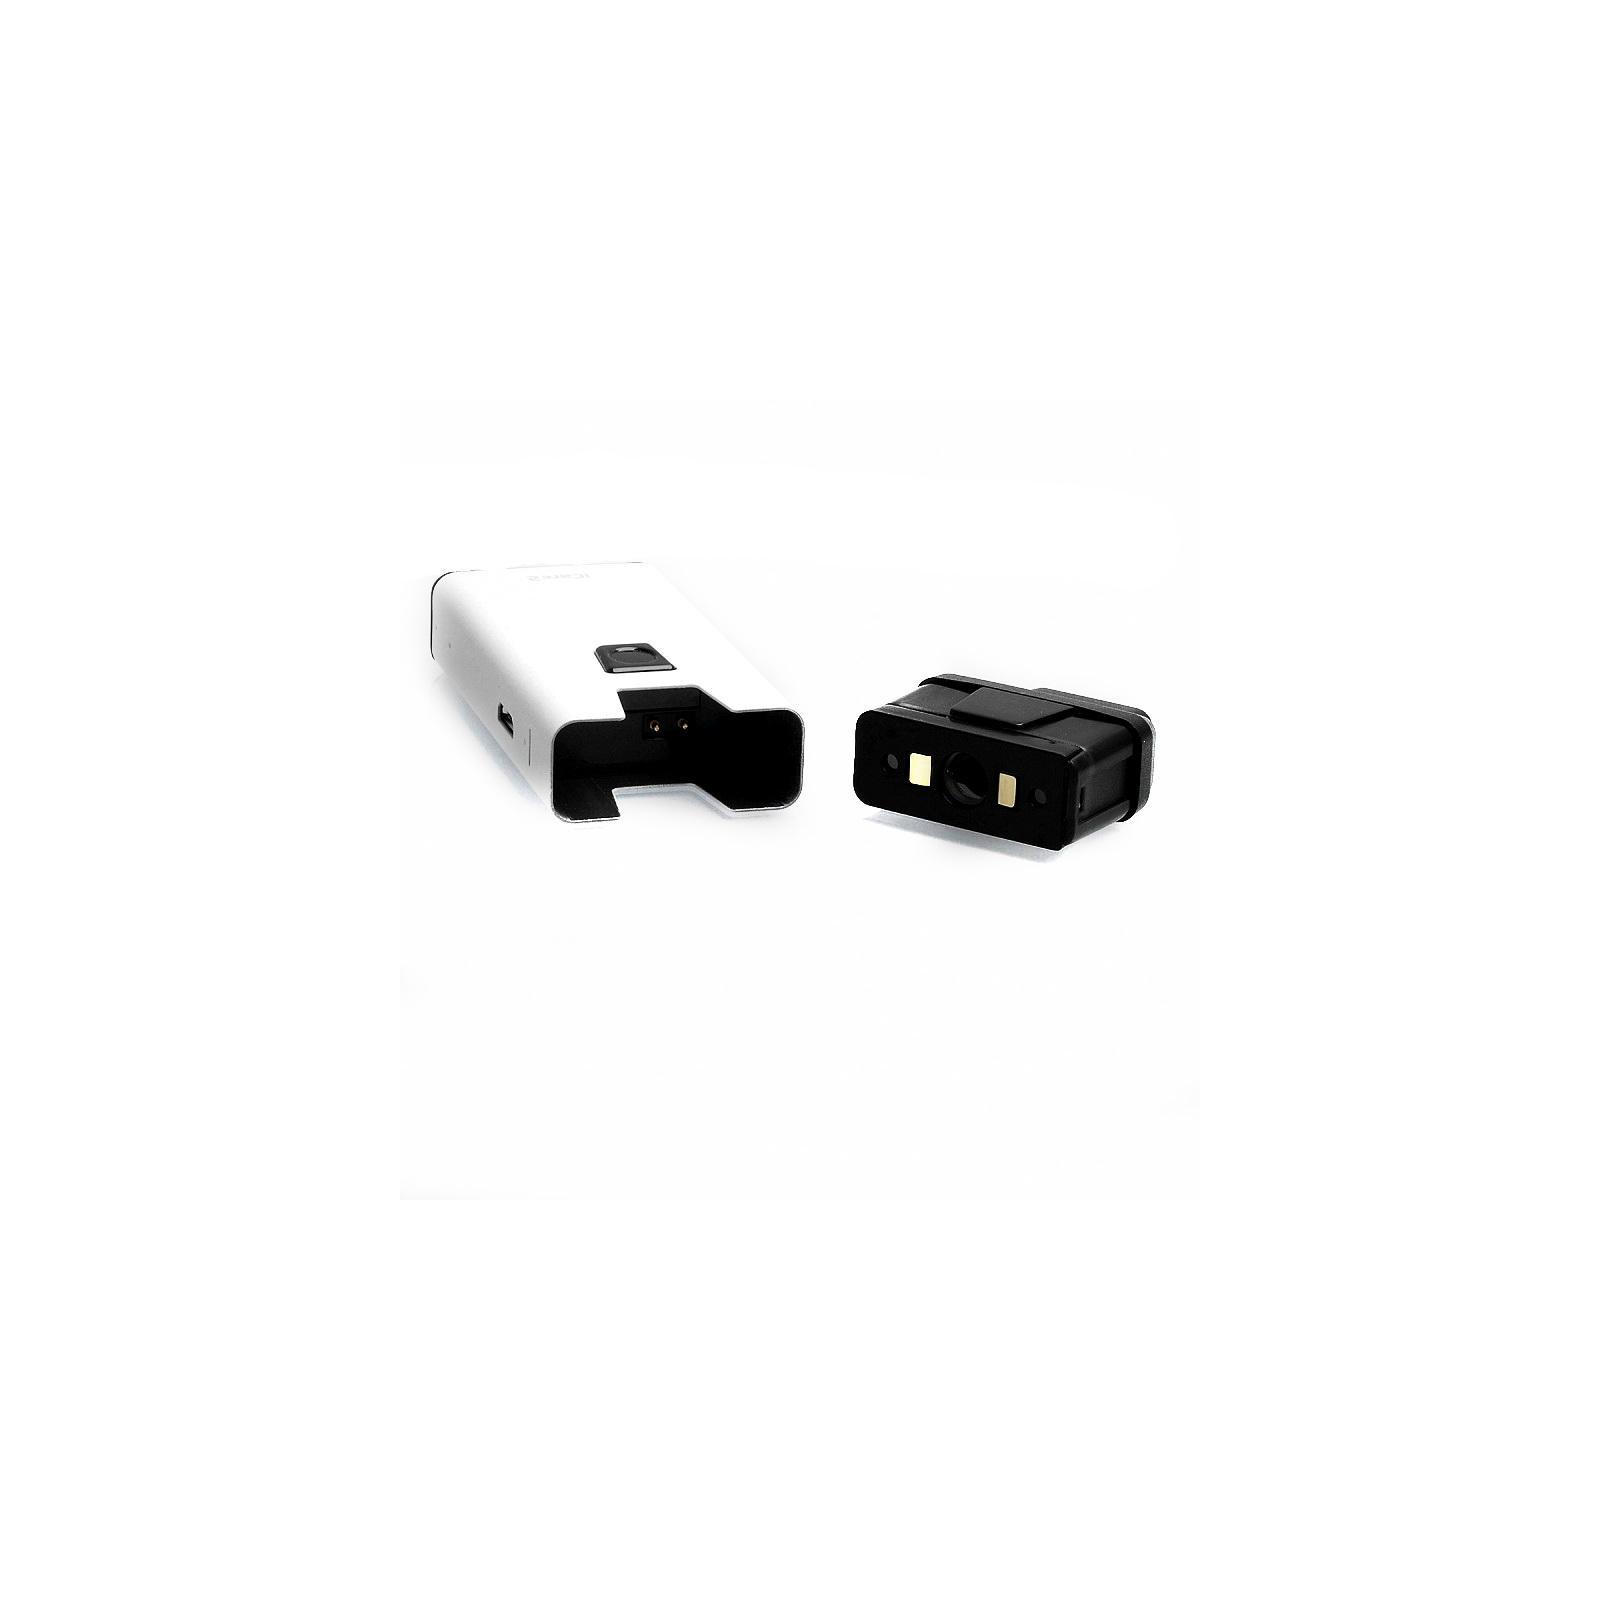 Стартовый набор Eleaf iCare 2 Kit White (EICAR2KW) изображение 5